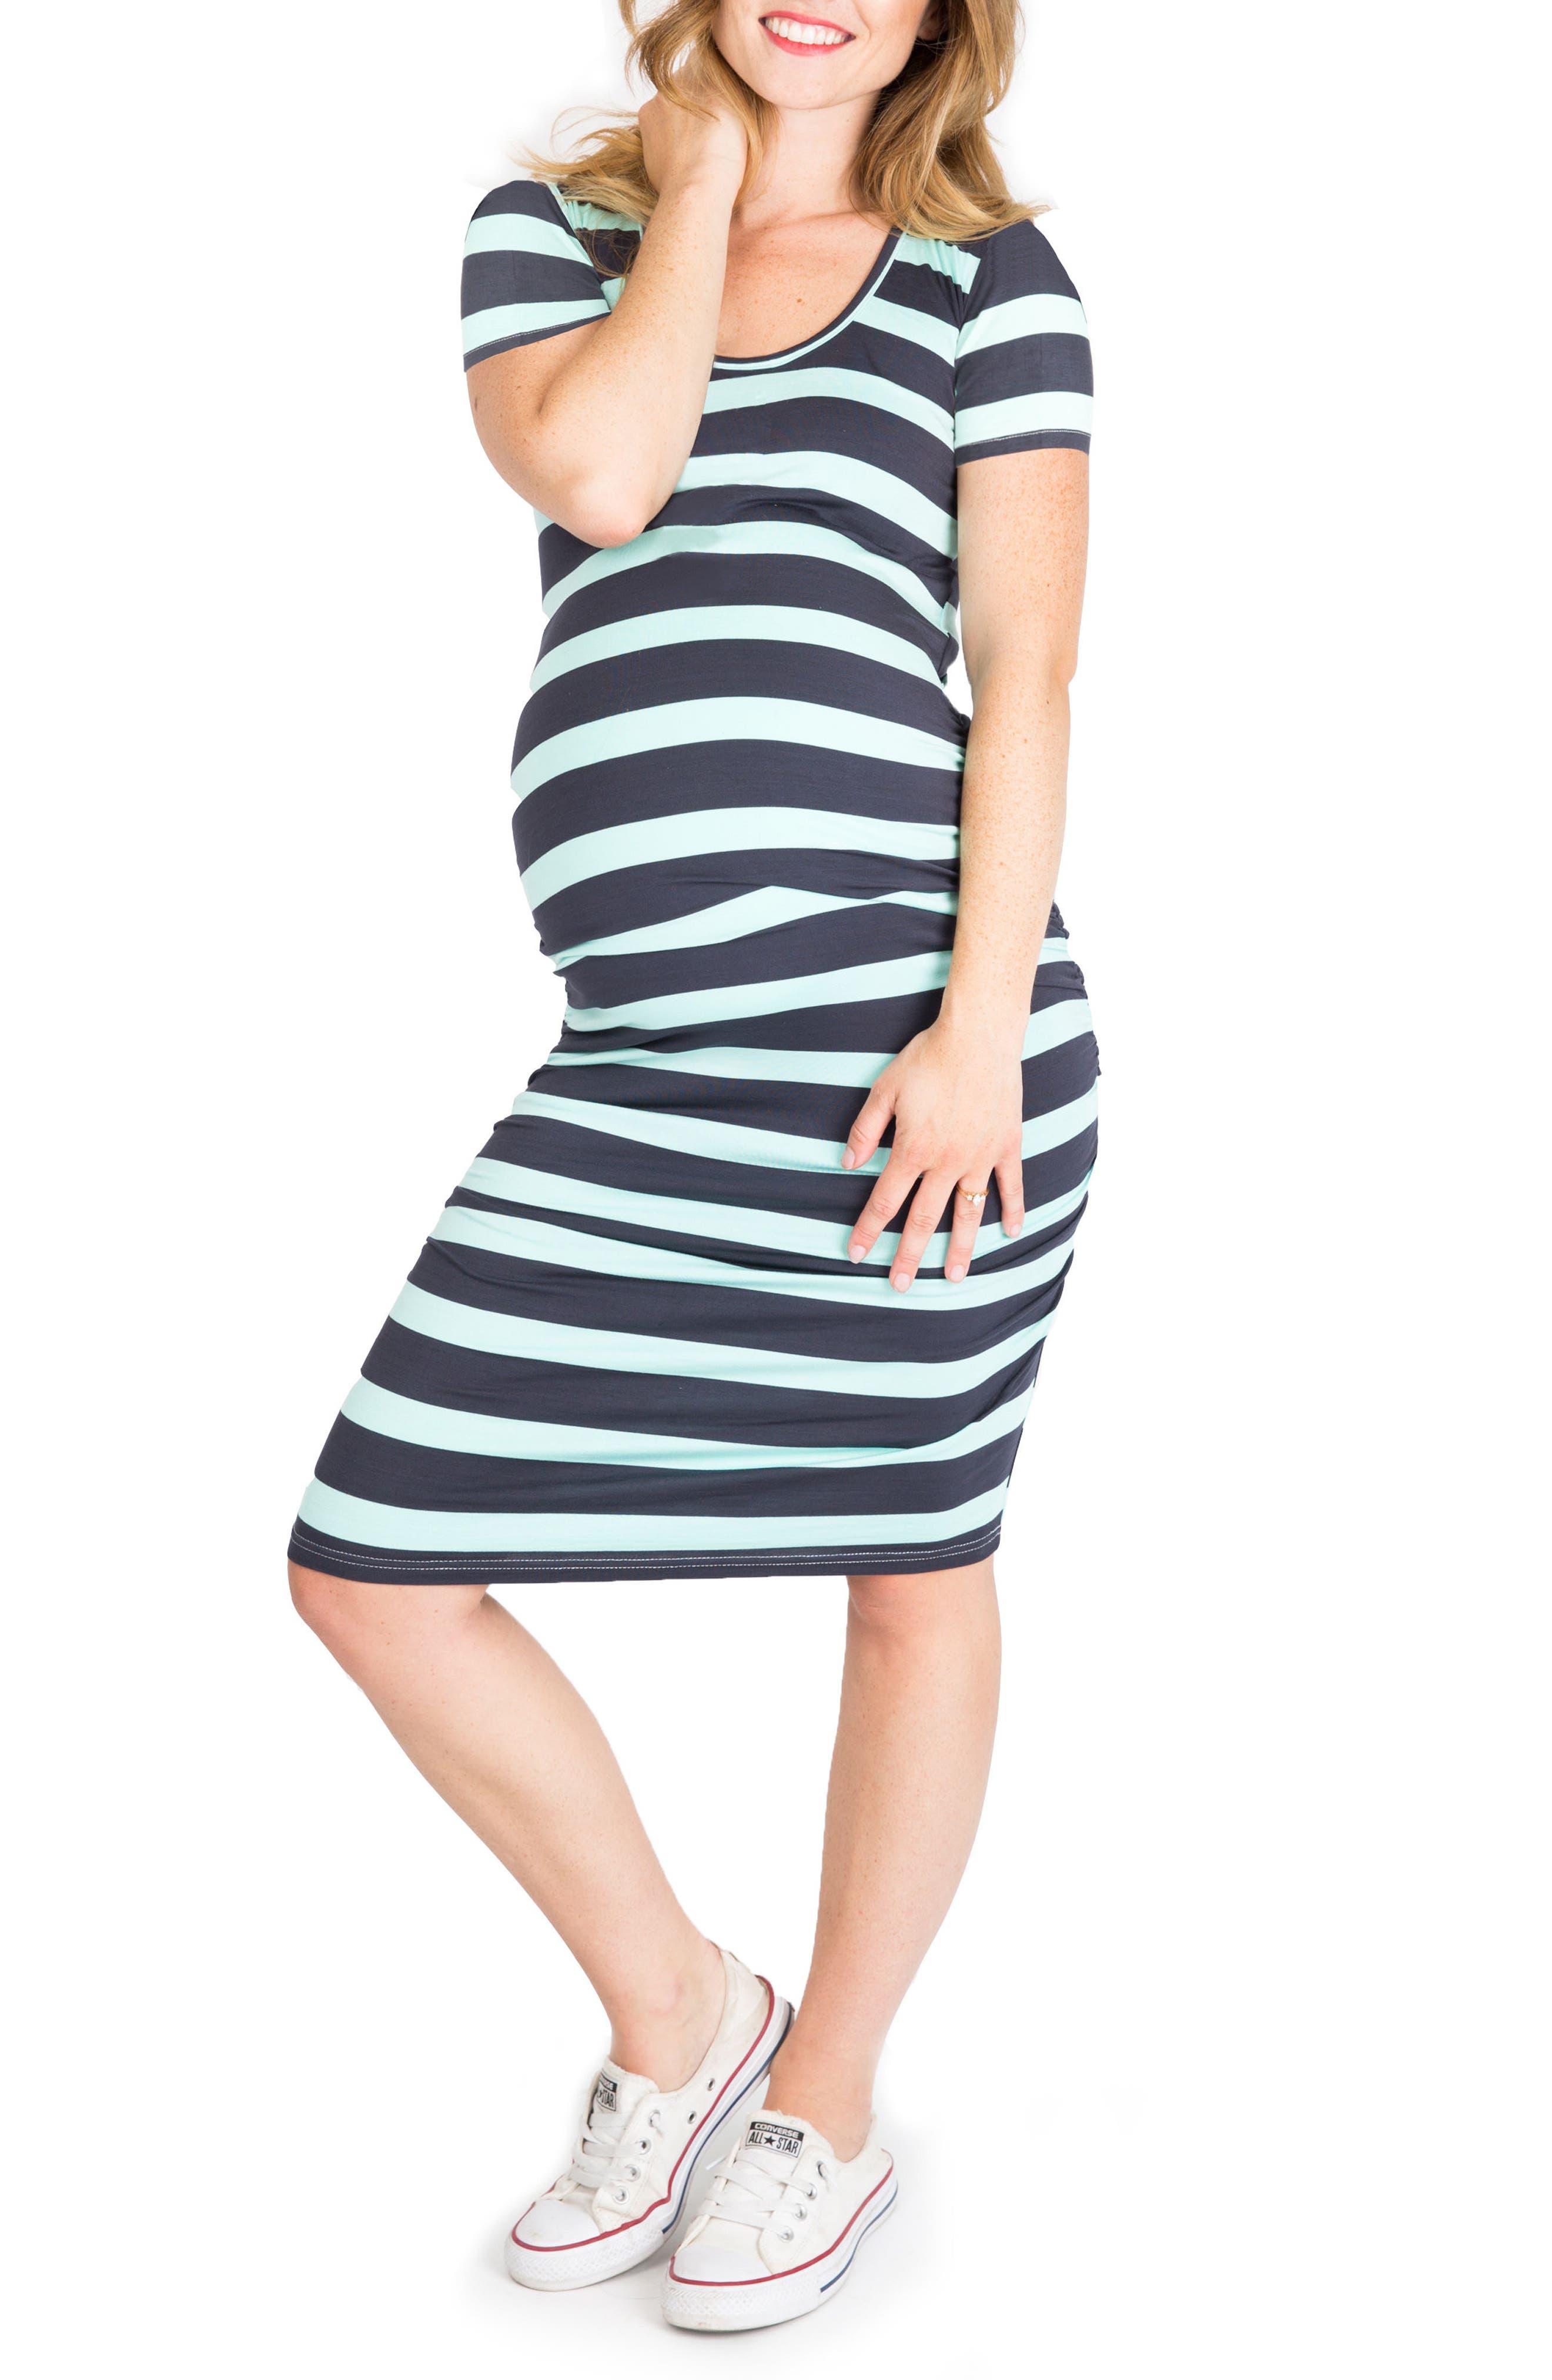 'Hailey' Maternity Dress,                         Main,                         color, Mint/ Slate Stripe